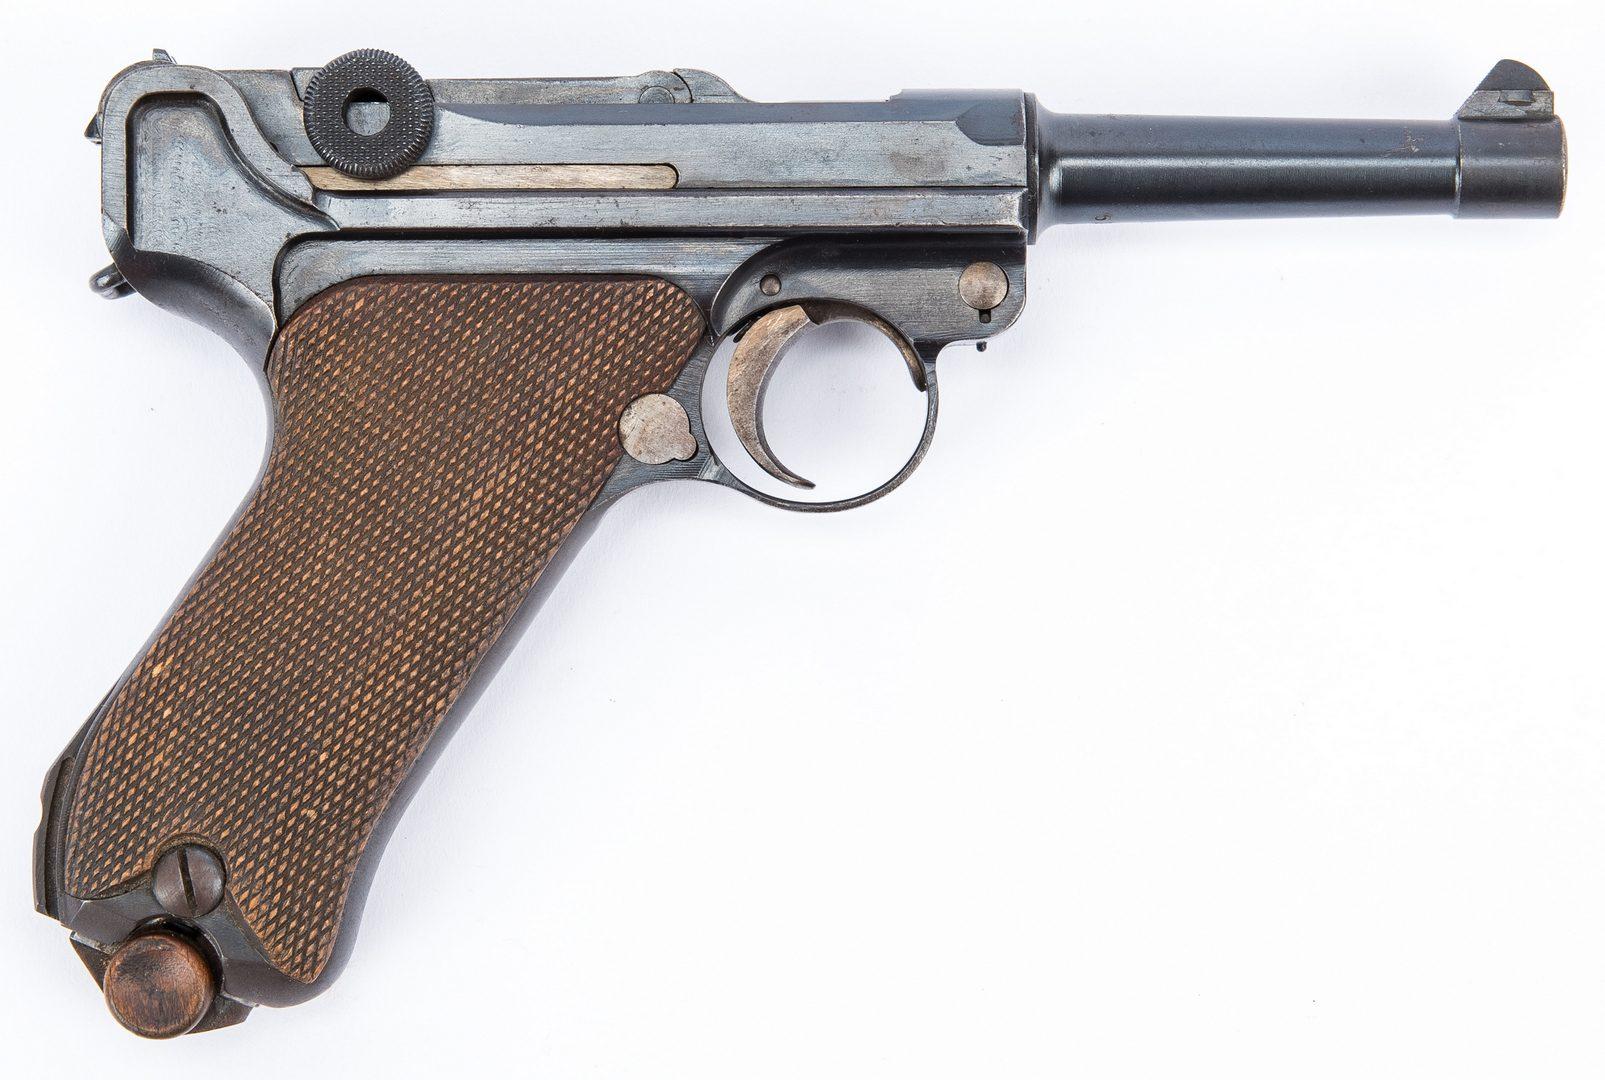 Lot 726: 1920 Commercial DWM Weimar Republic era Luger